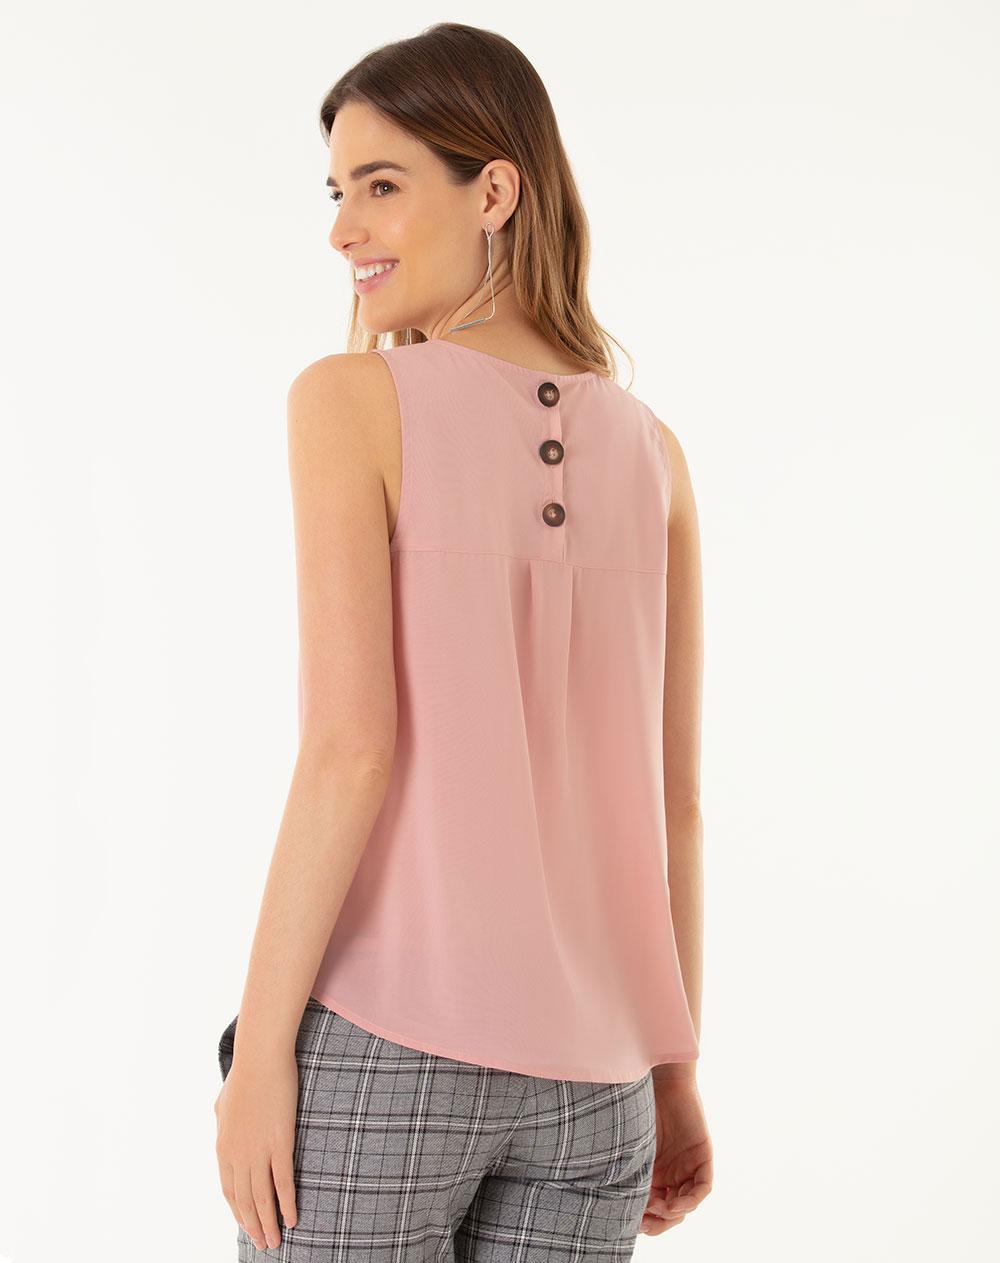 ba68dc96c781 Camisas para Mujer Gef